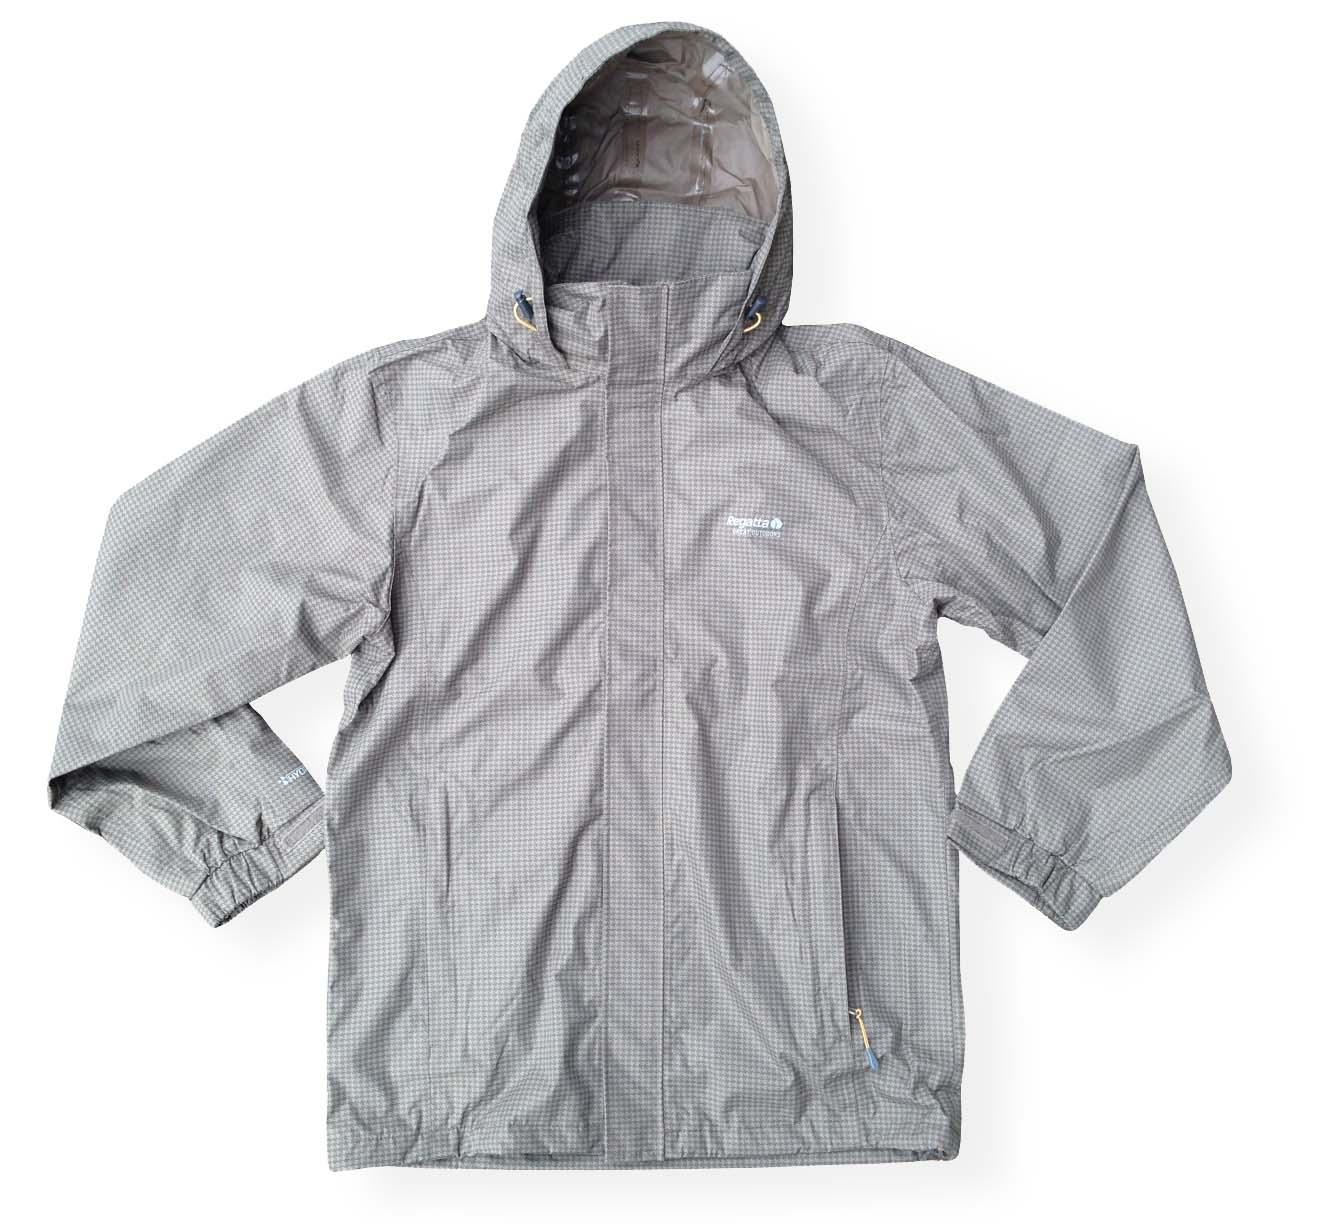 Mens-Regatta-Dare2b-Lightweight-Waterproof-Windproof-Jacket-Clearance-RRP-70-00 thumbnail 64